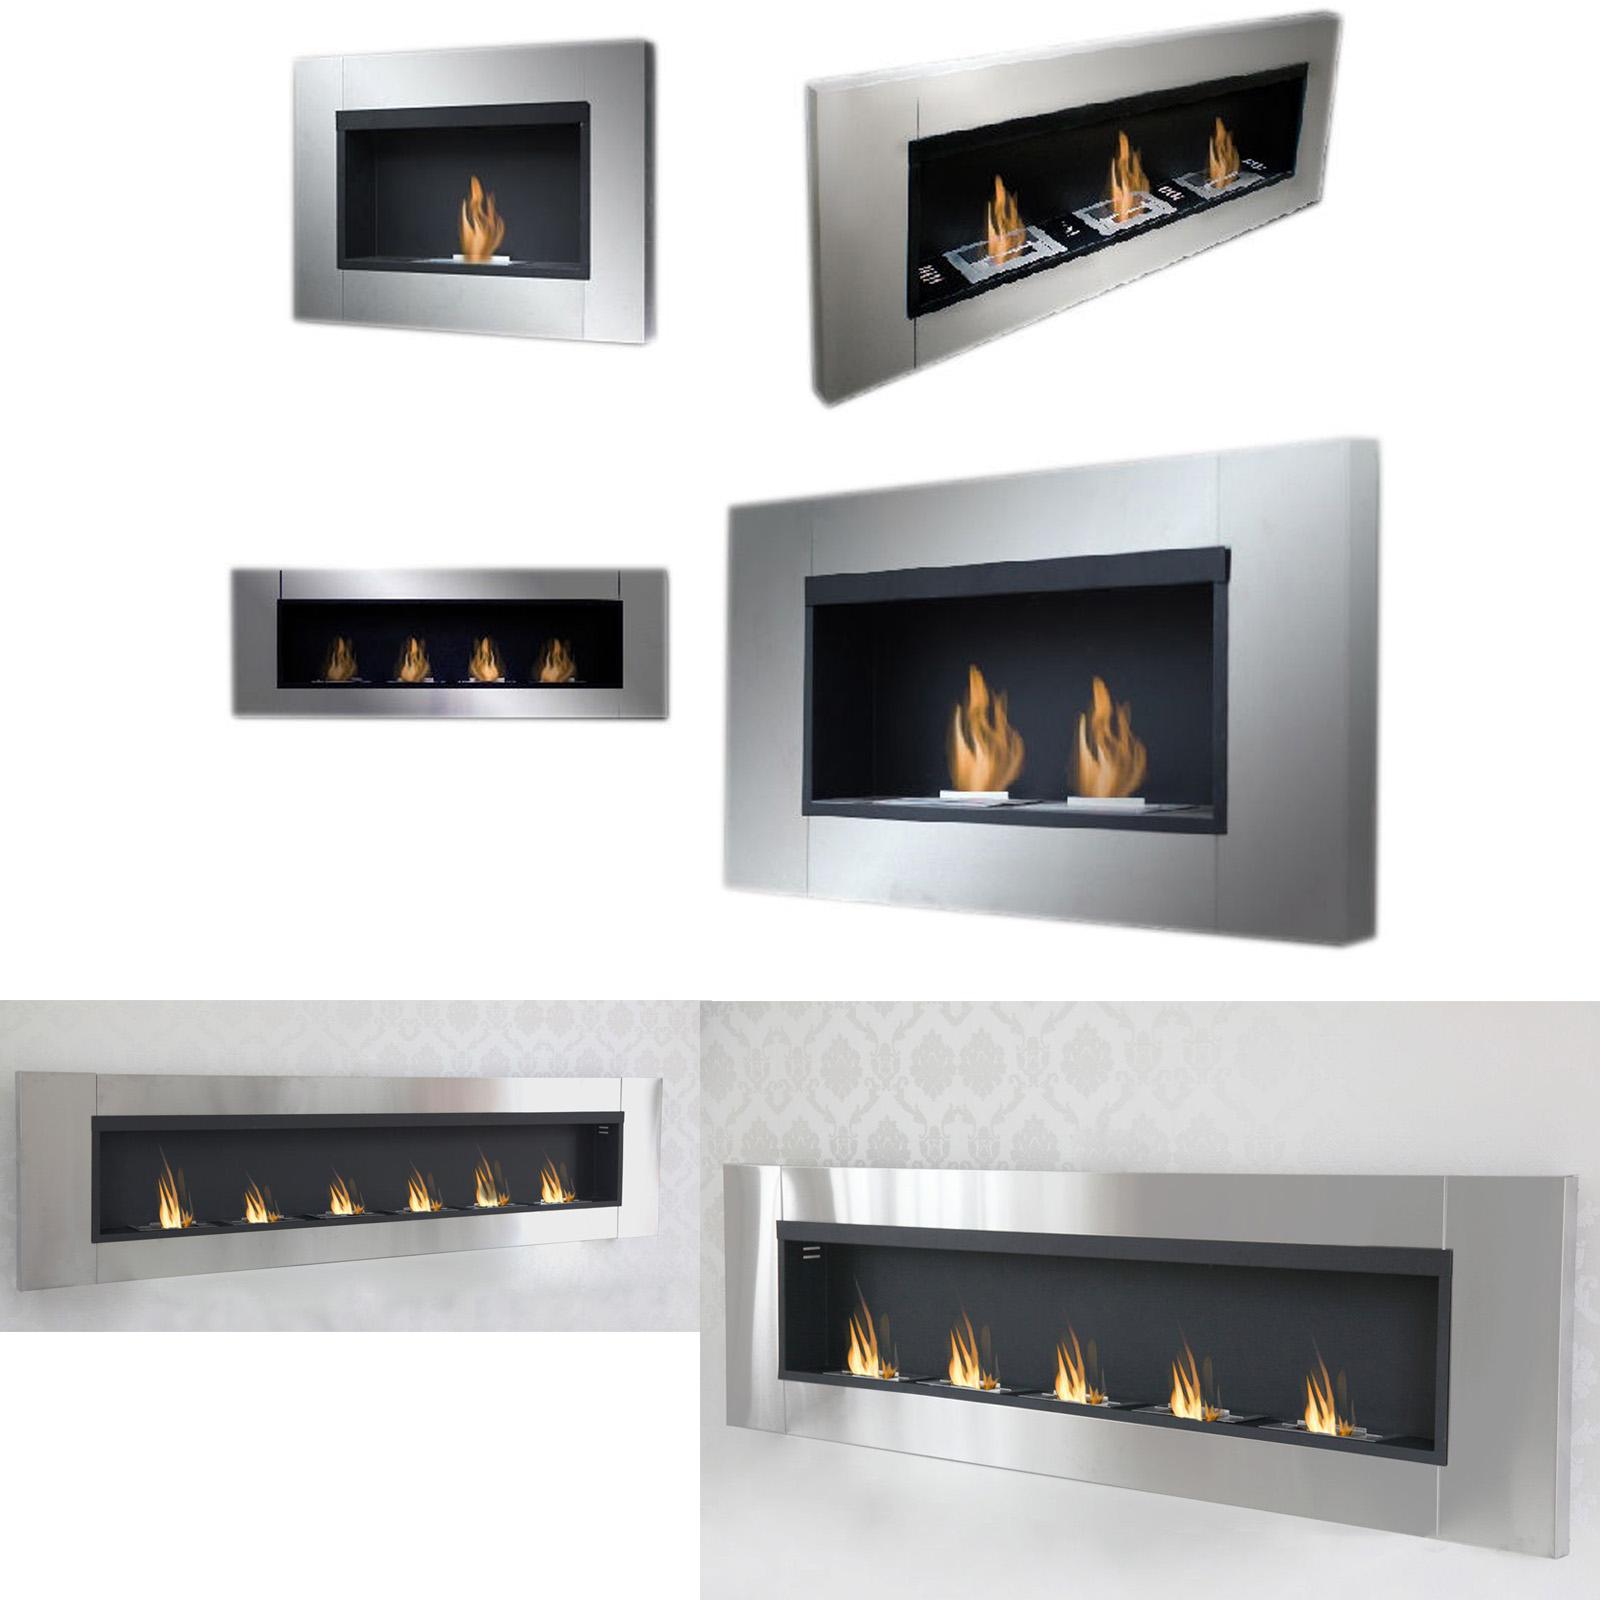 bio ethanol wandkamin chemin e gel kamin gelkamin. Black Bedroom Furniture Sets. Home Design Ideas